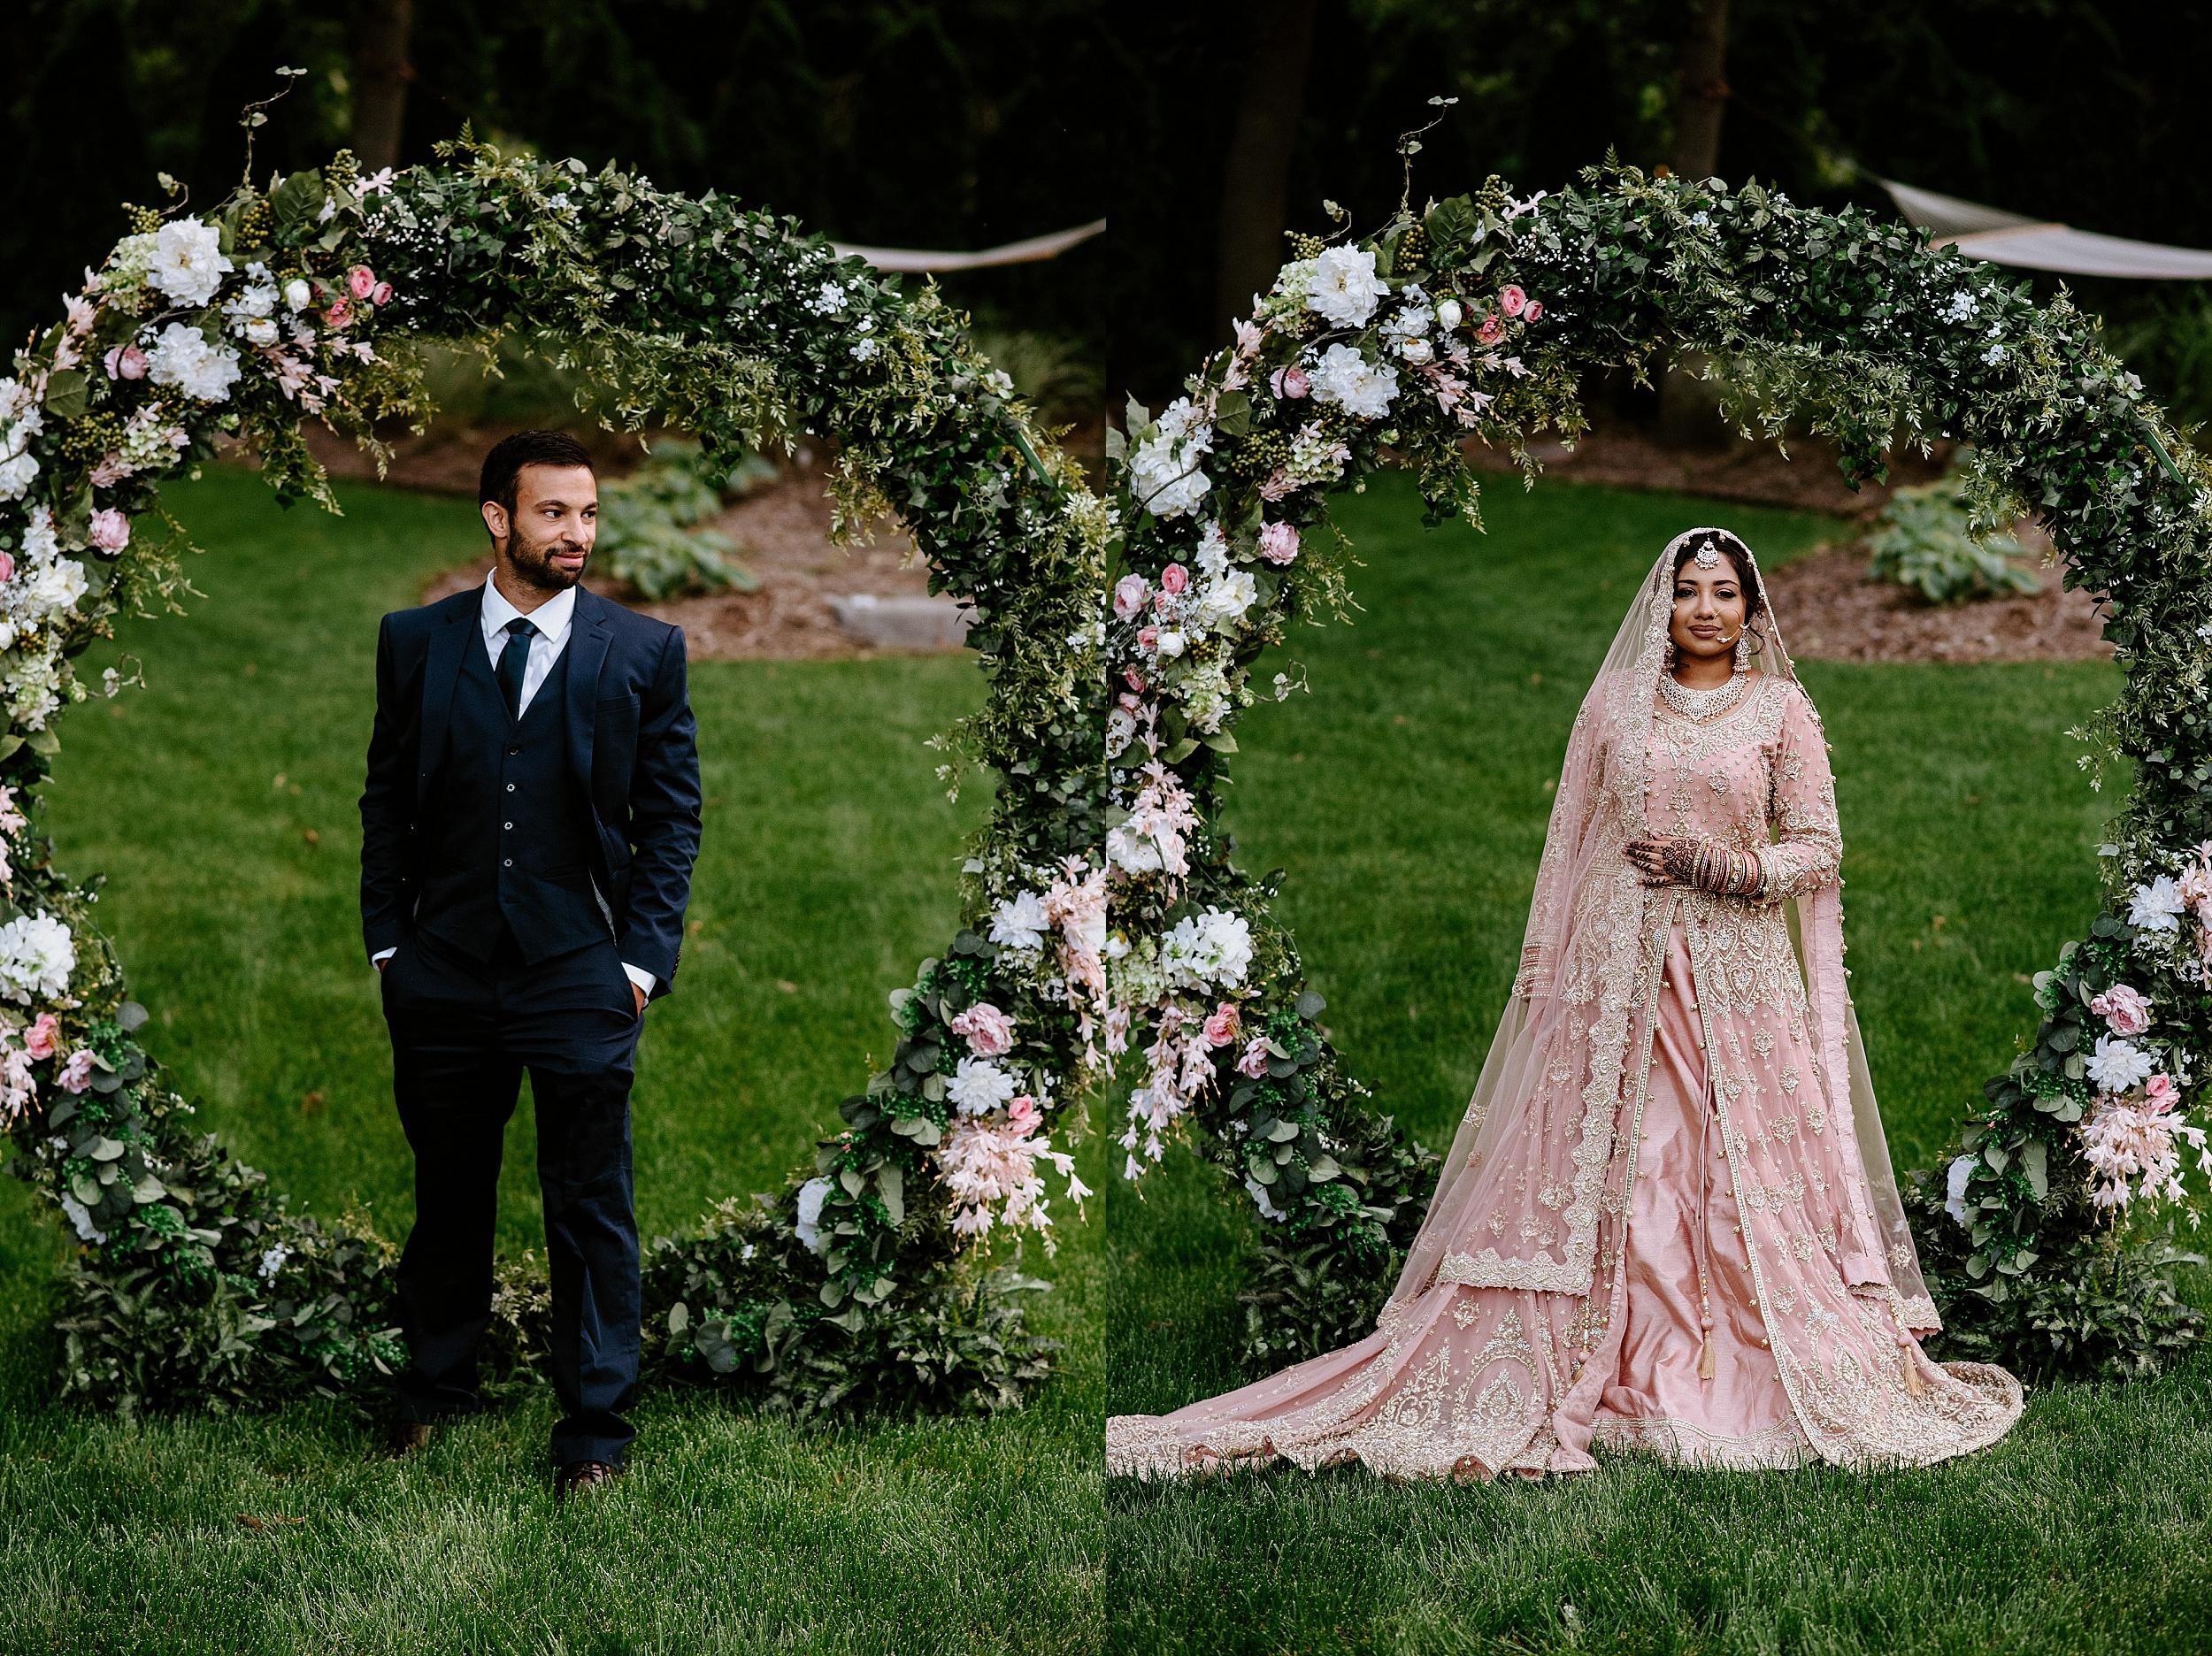 South Asian wedding | Minimony